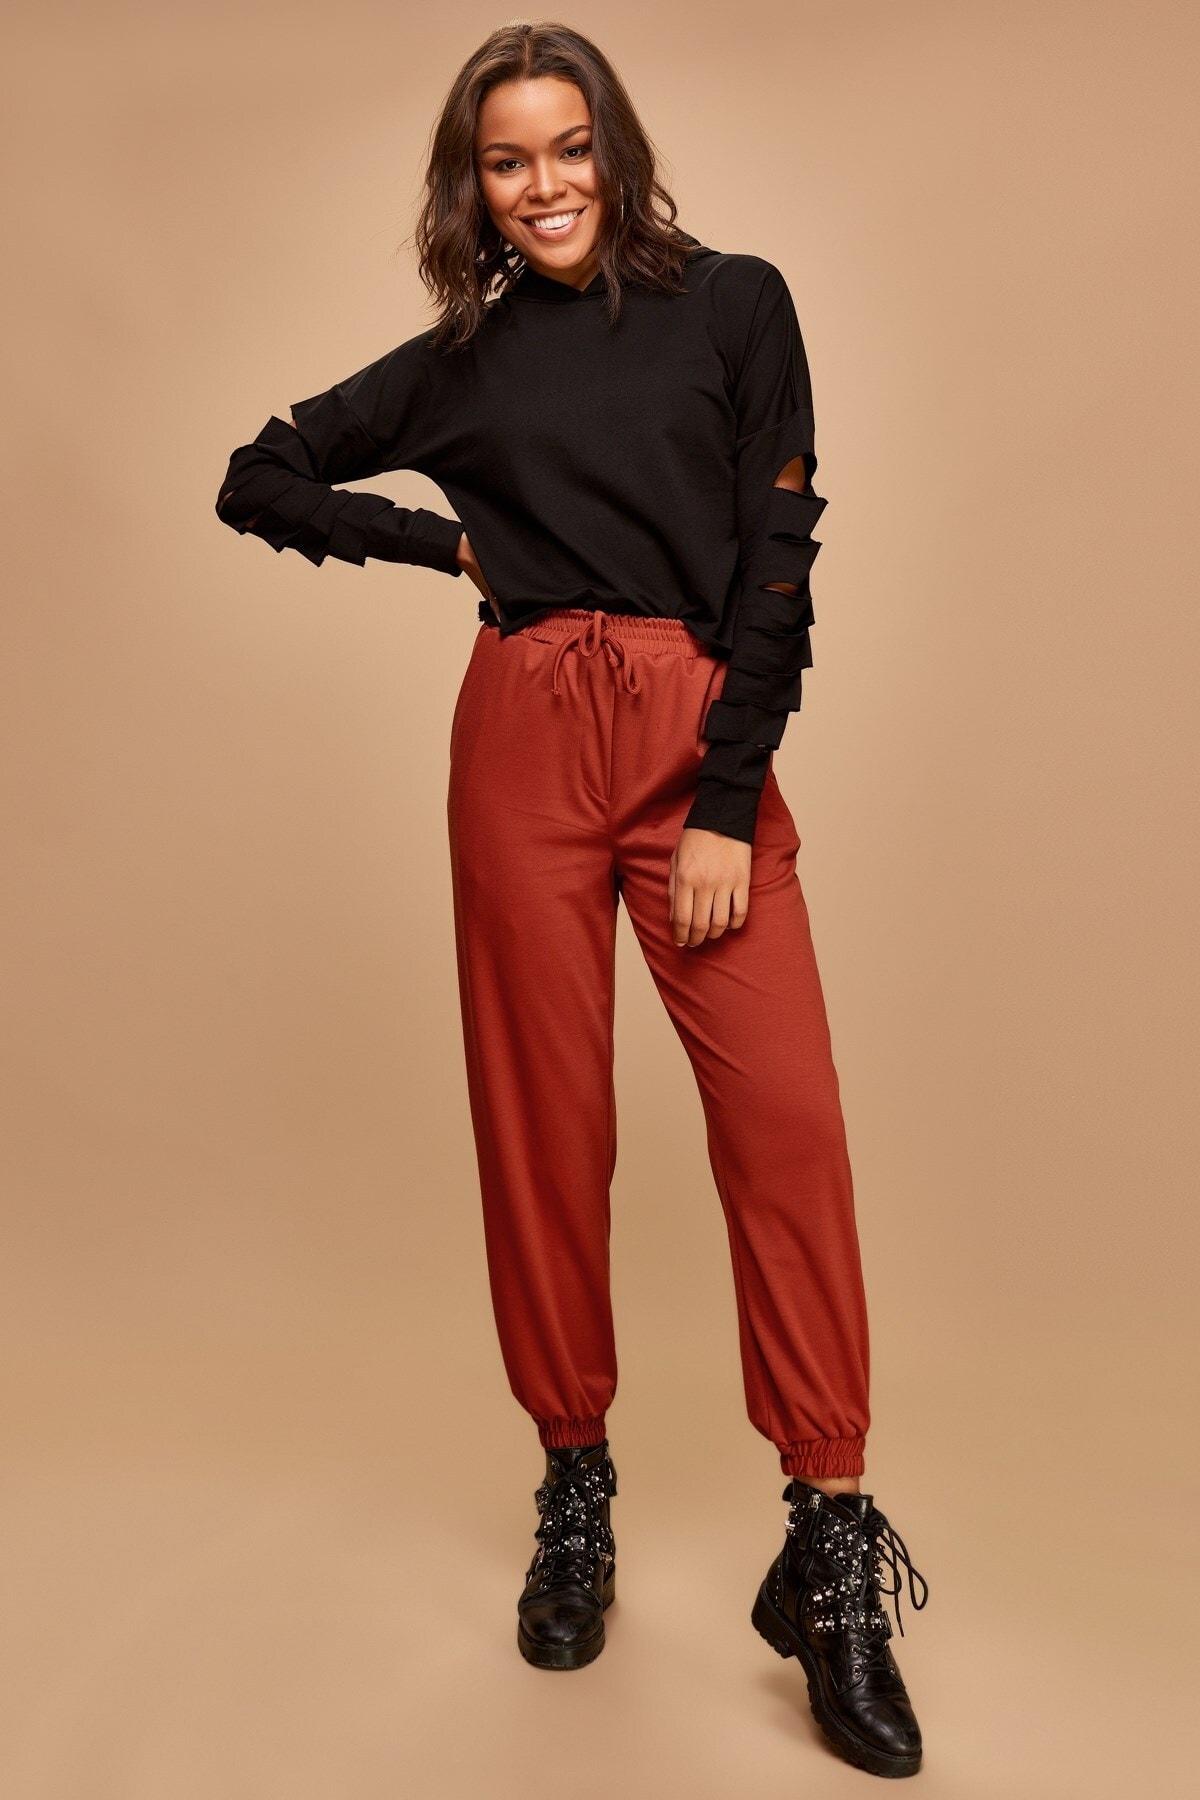 Boutiquen Kadın Kiremit Bilekleri Lastikli Cepli Pantolon 5025